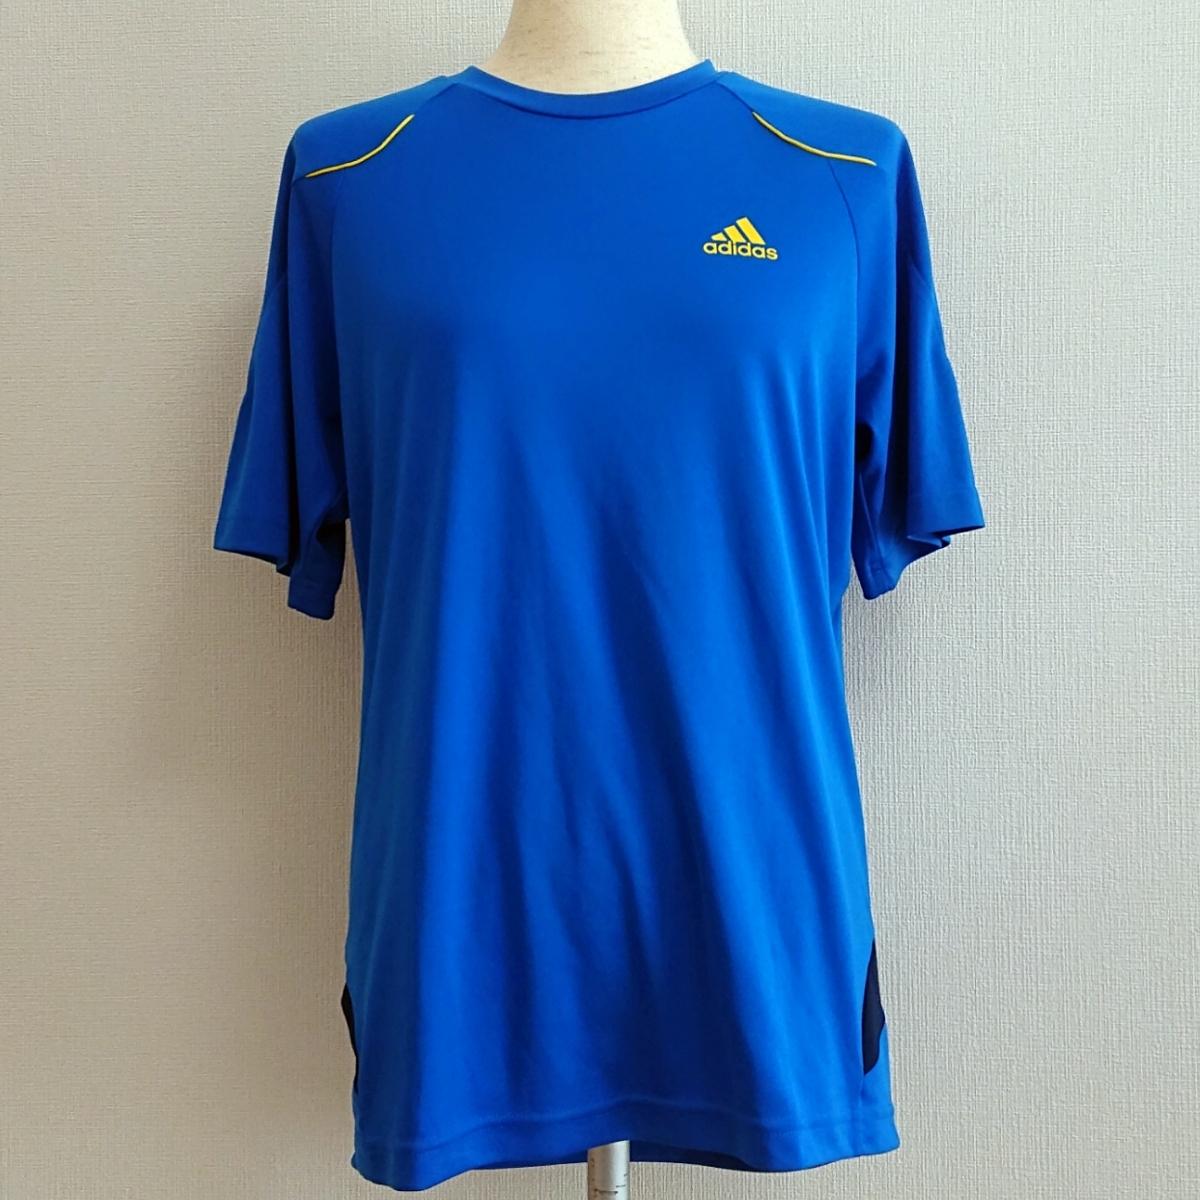 adidas アディダス Tシャツ メンズS 男性半袖Tシャツ 半袖シャツ